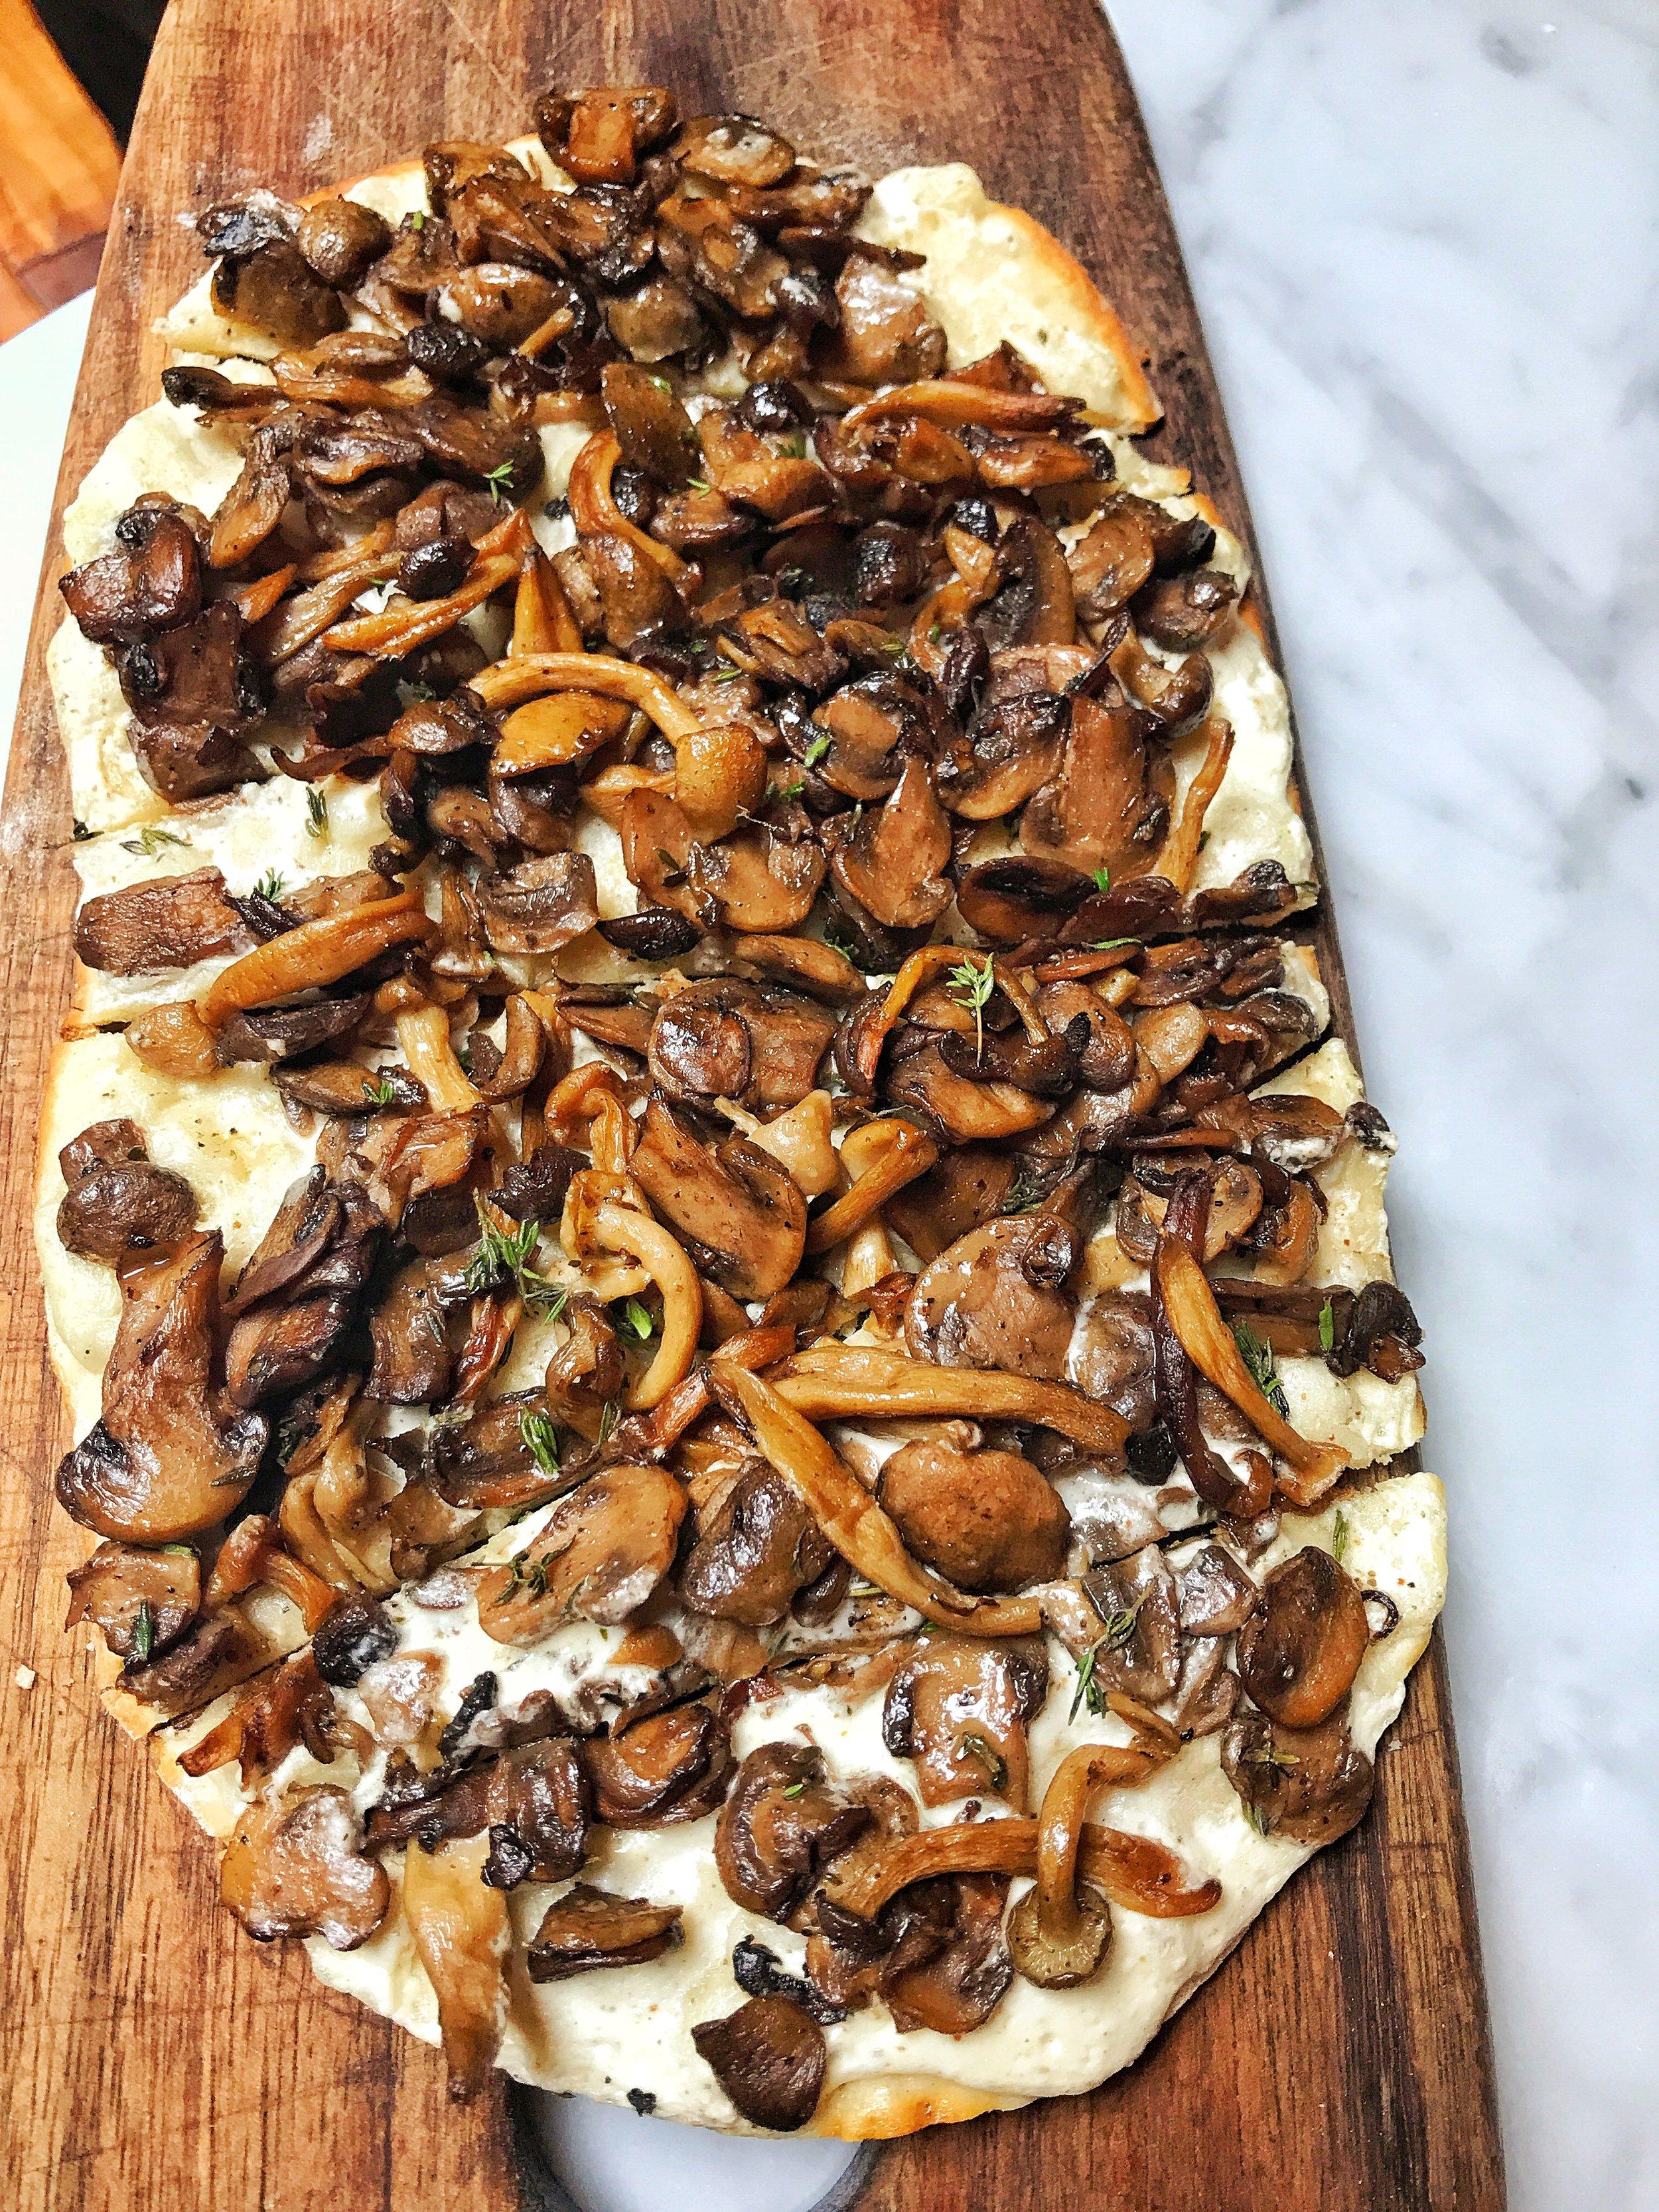 Wild mushroom and creme fraiche flatbread